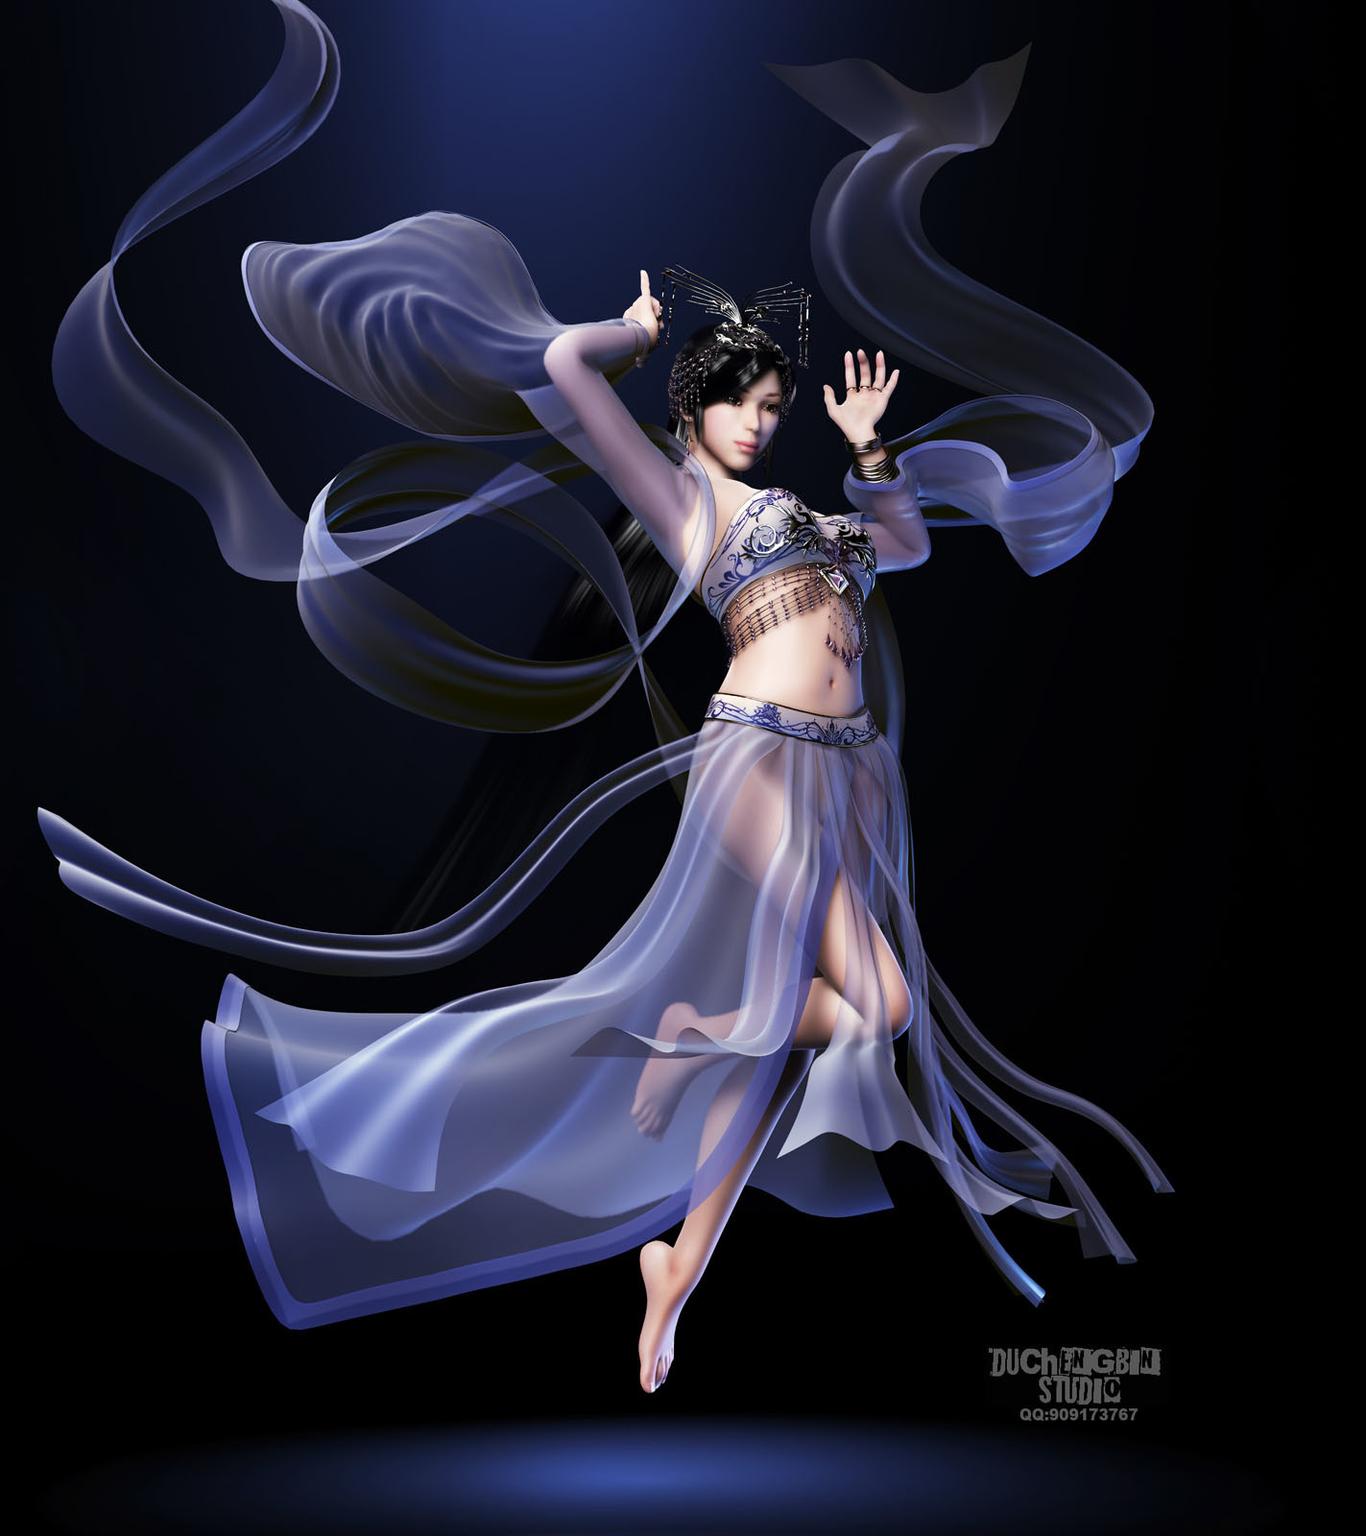 Chengbindu chinese faery 1 124fd7f0 d8pn